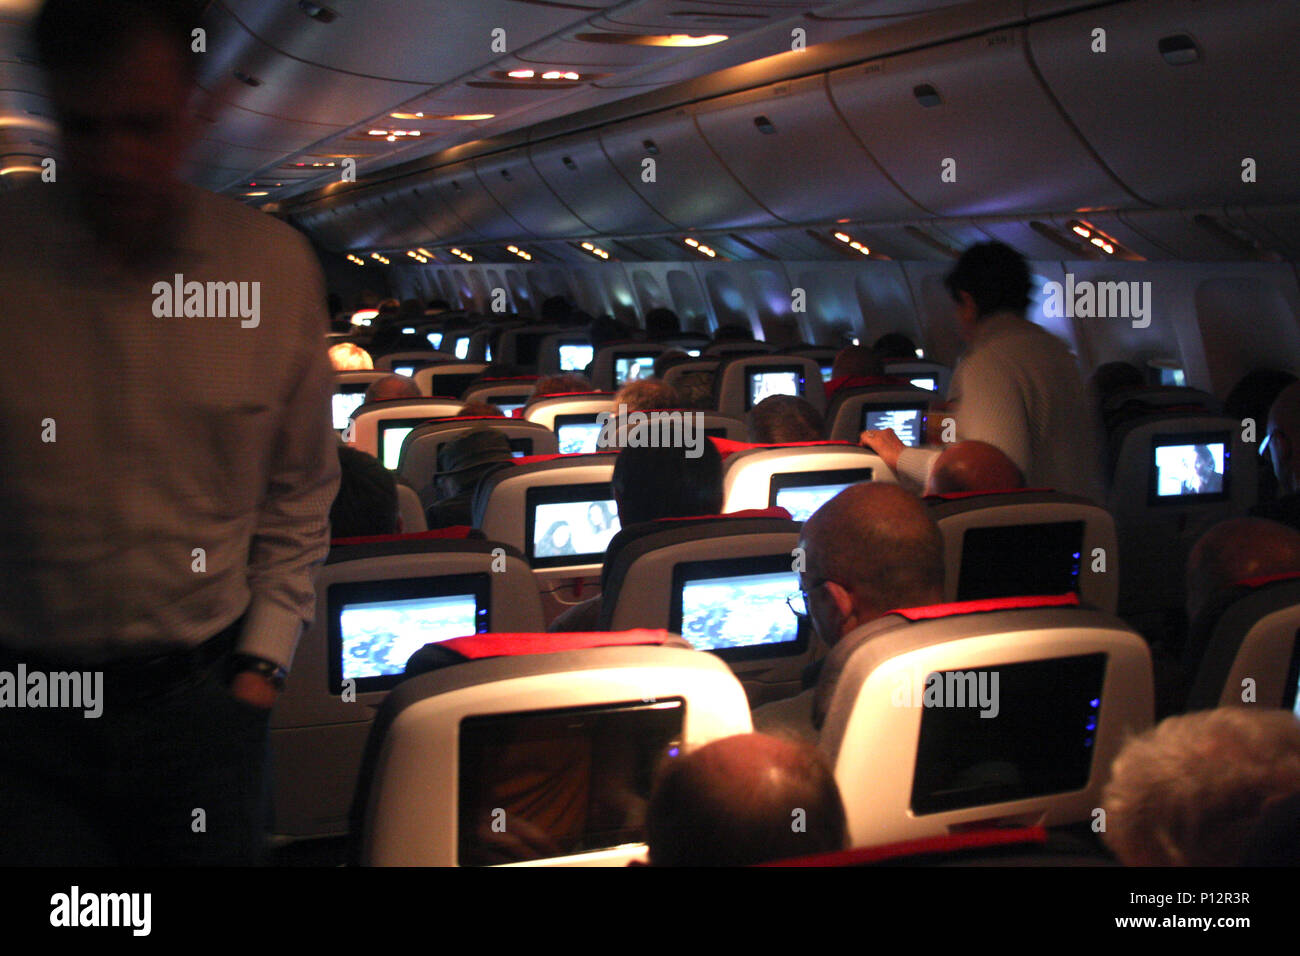 Interior of airplane during night flight - Stock Image